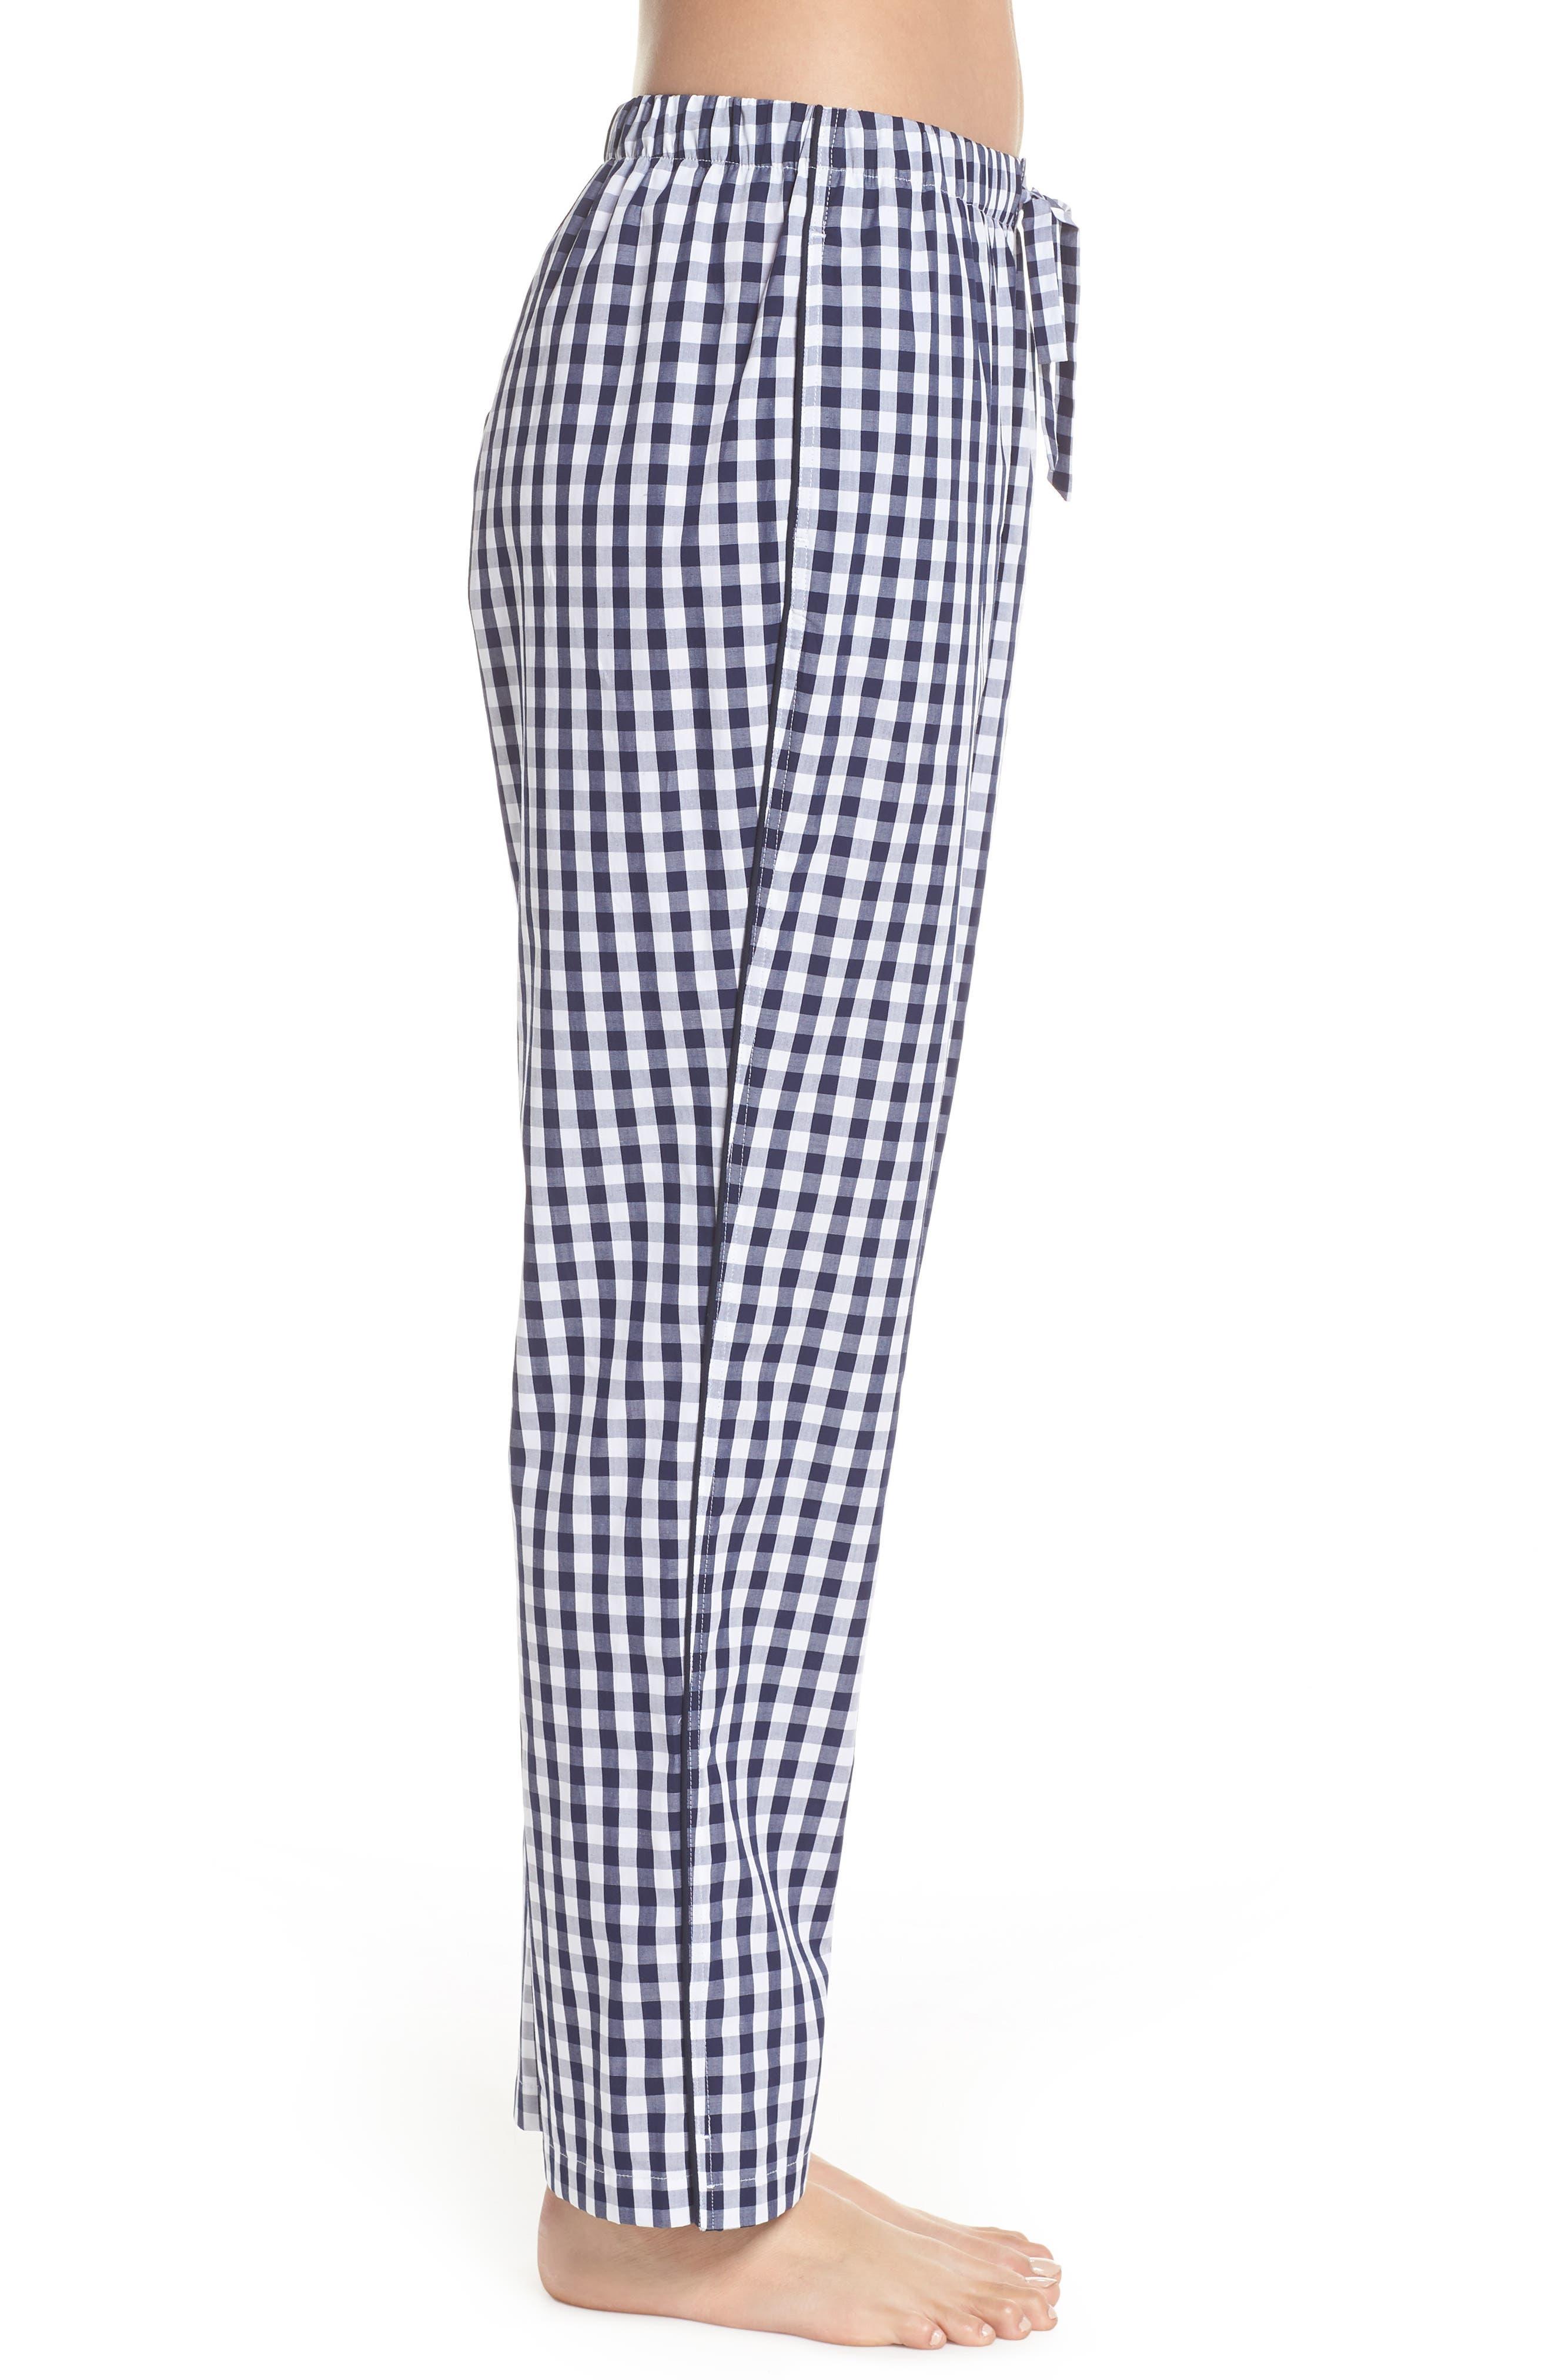 Marina Women's Pajama Pants,                             Alternate thumbnail 4, color,                             LARGE GINGHAM BLUE